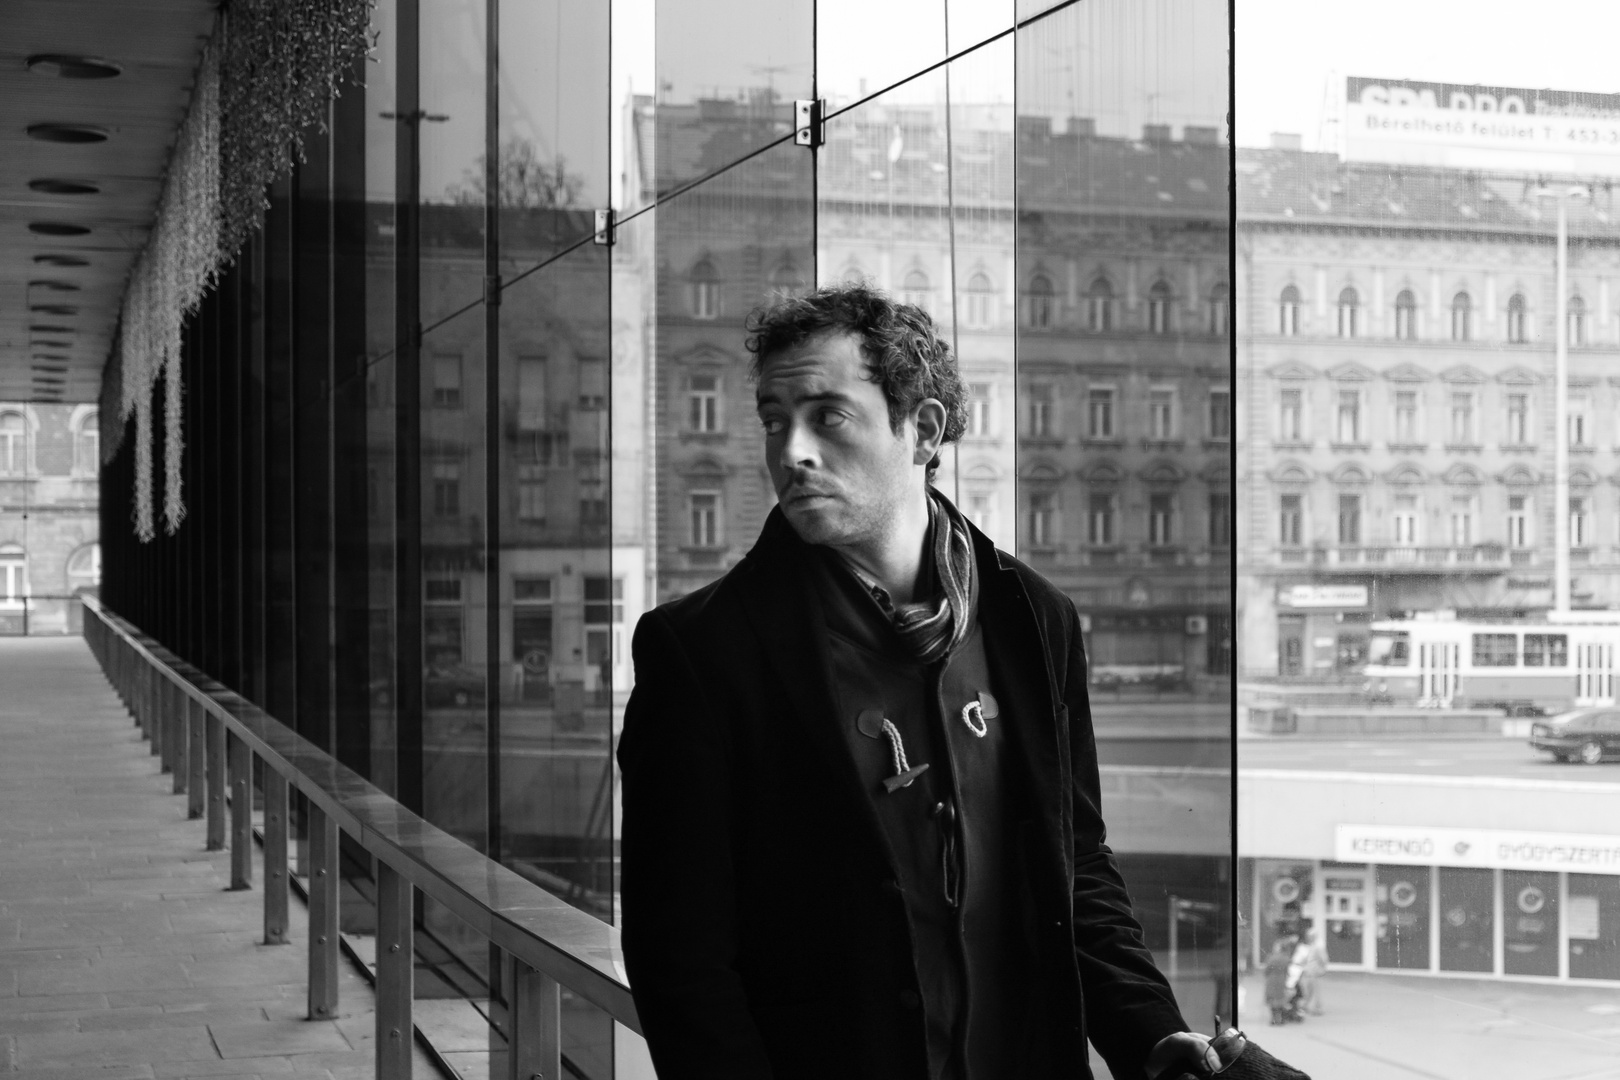 Portrait im Bahnhof